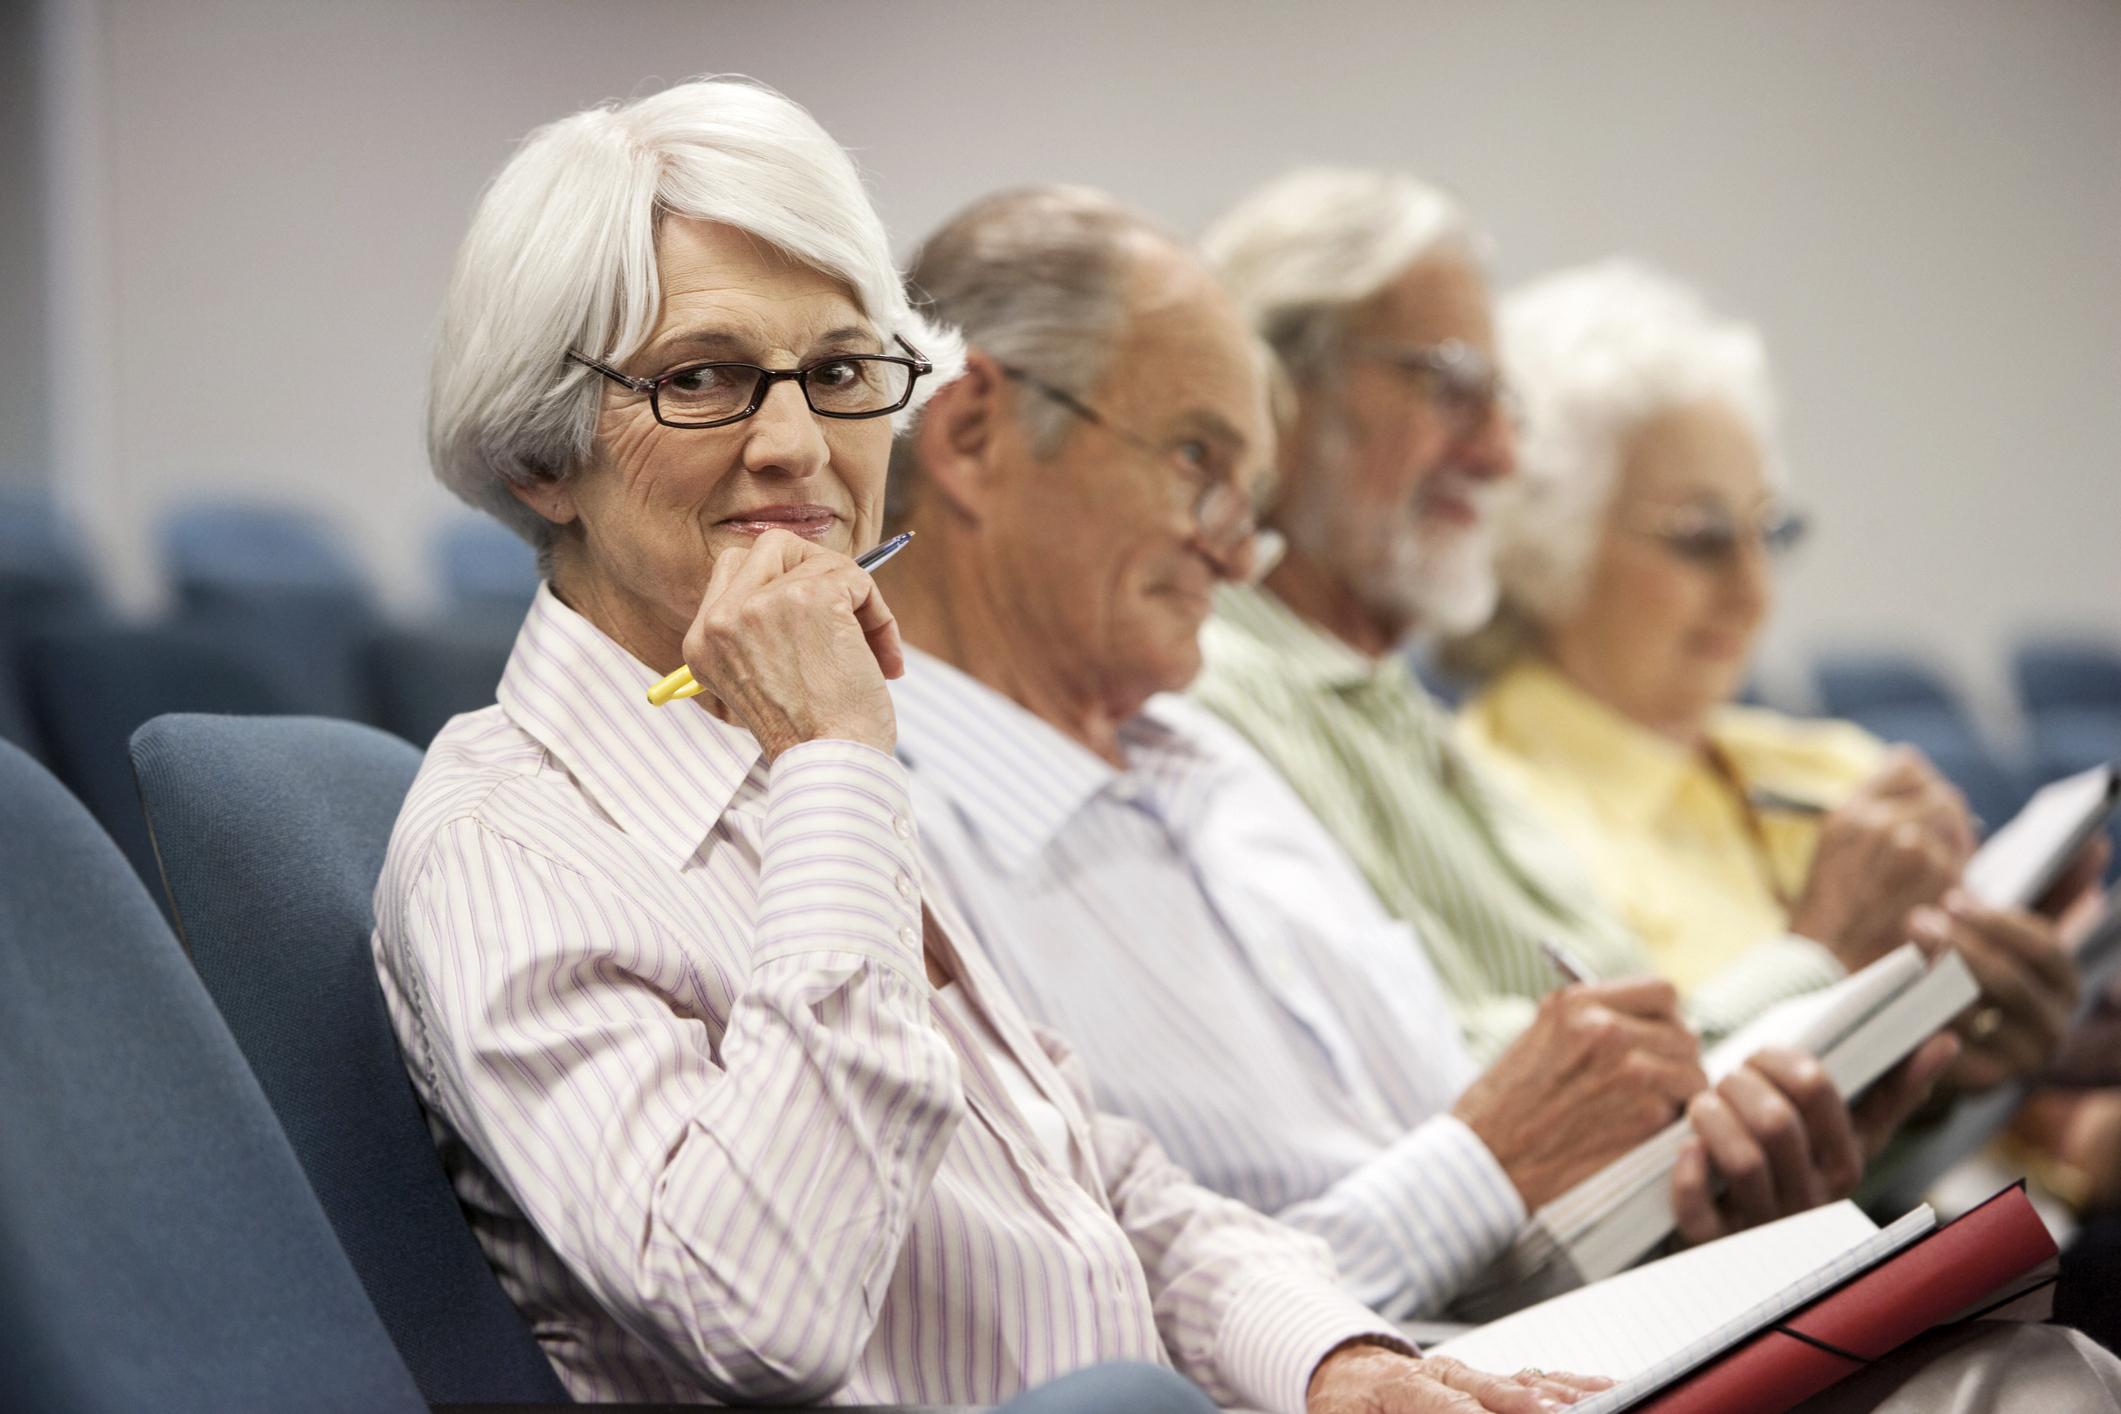 Image result for classroom senior citizen